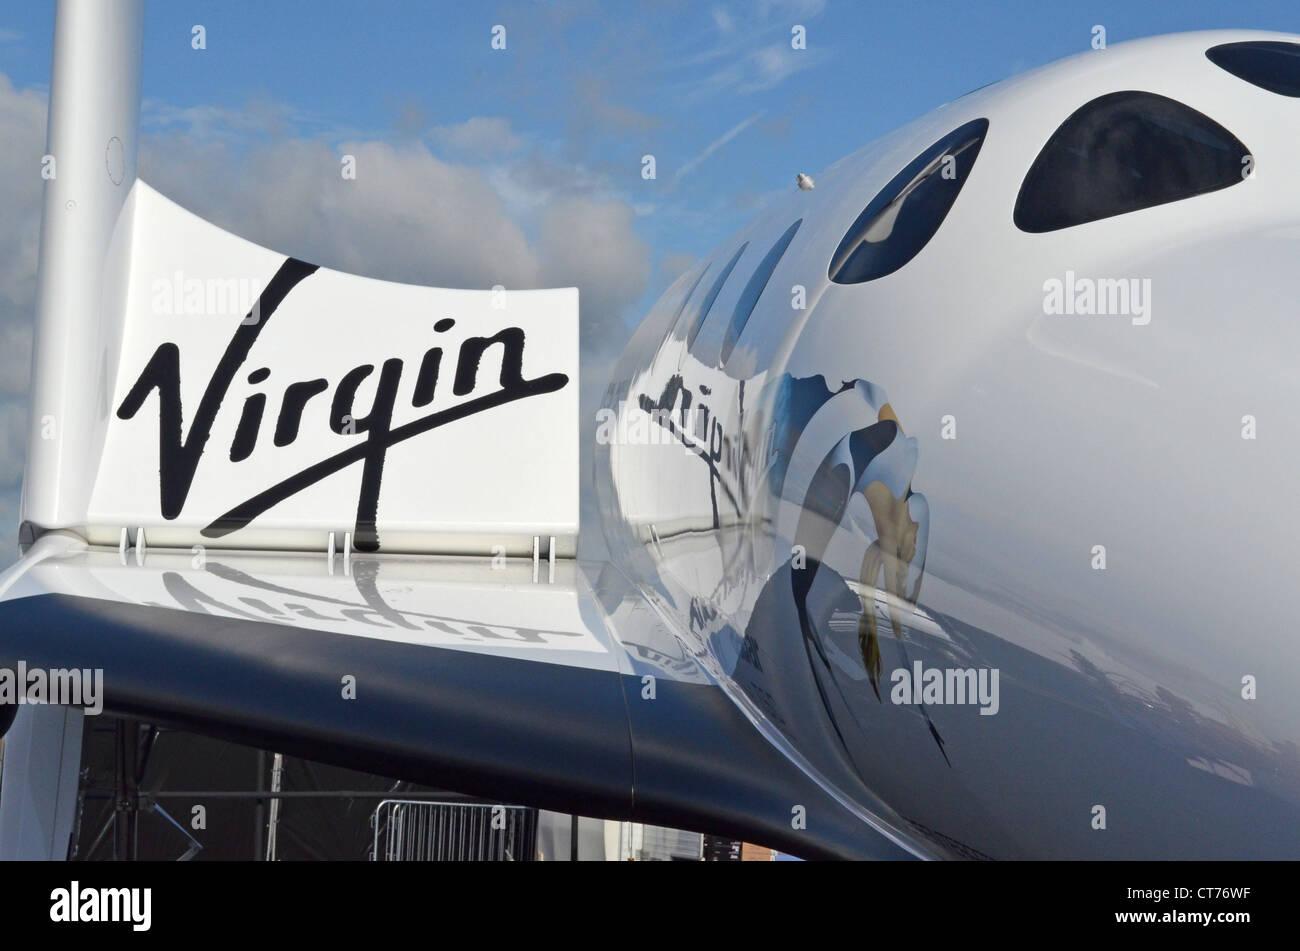 Virgin Galactic's SpaceShipTwo spaceplane at the Farnborough Air Show 2012 - Stock Image